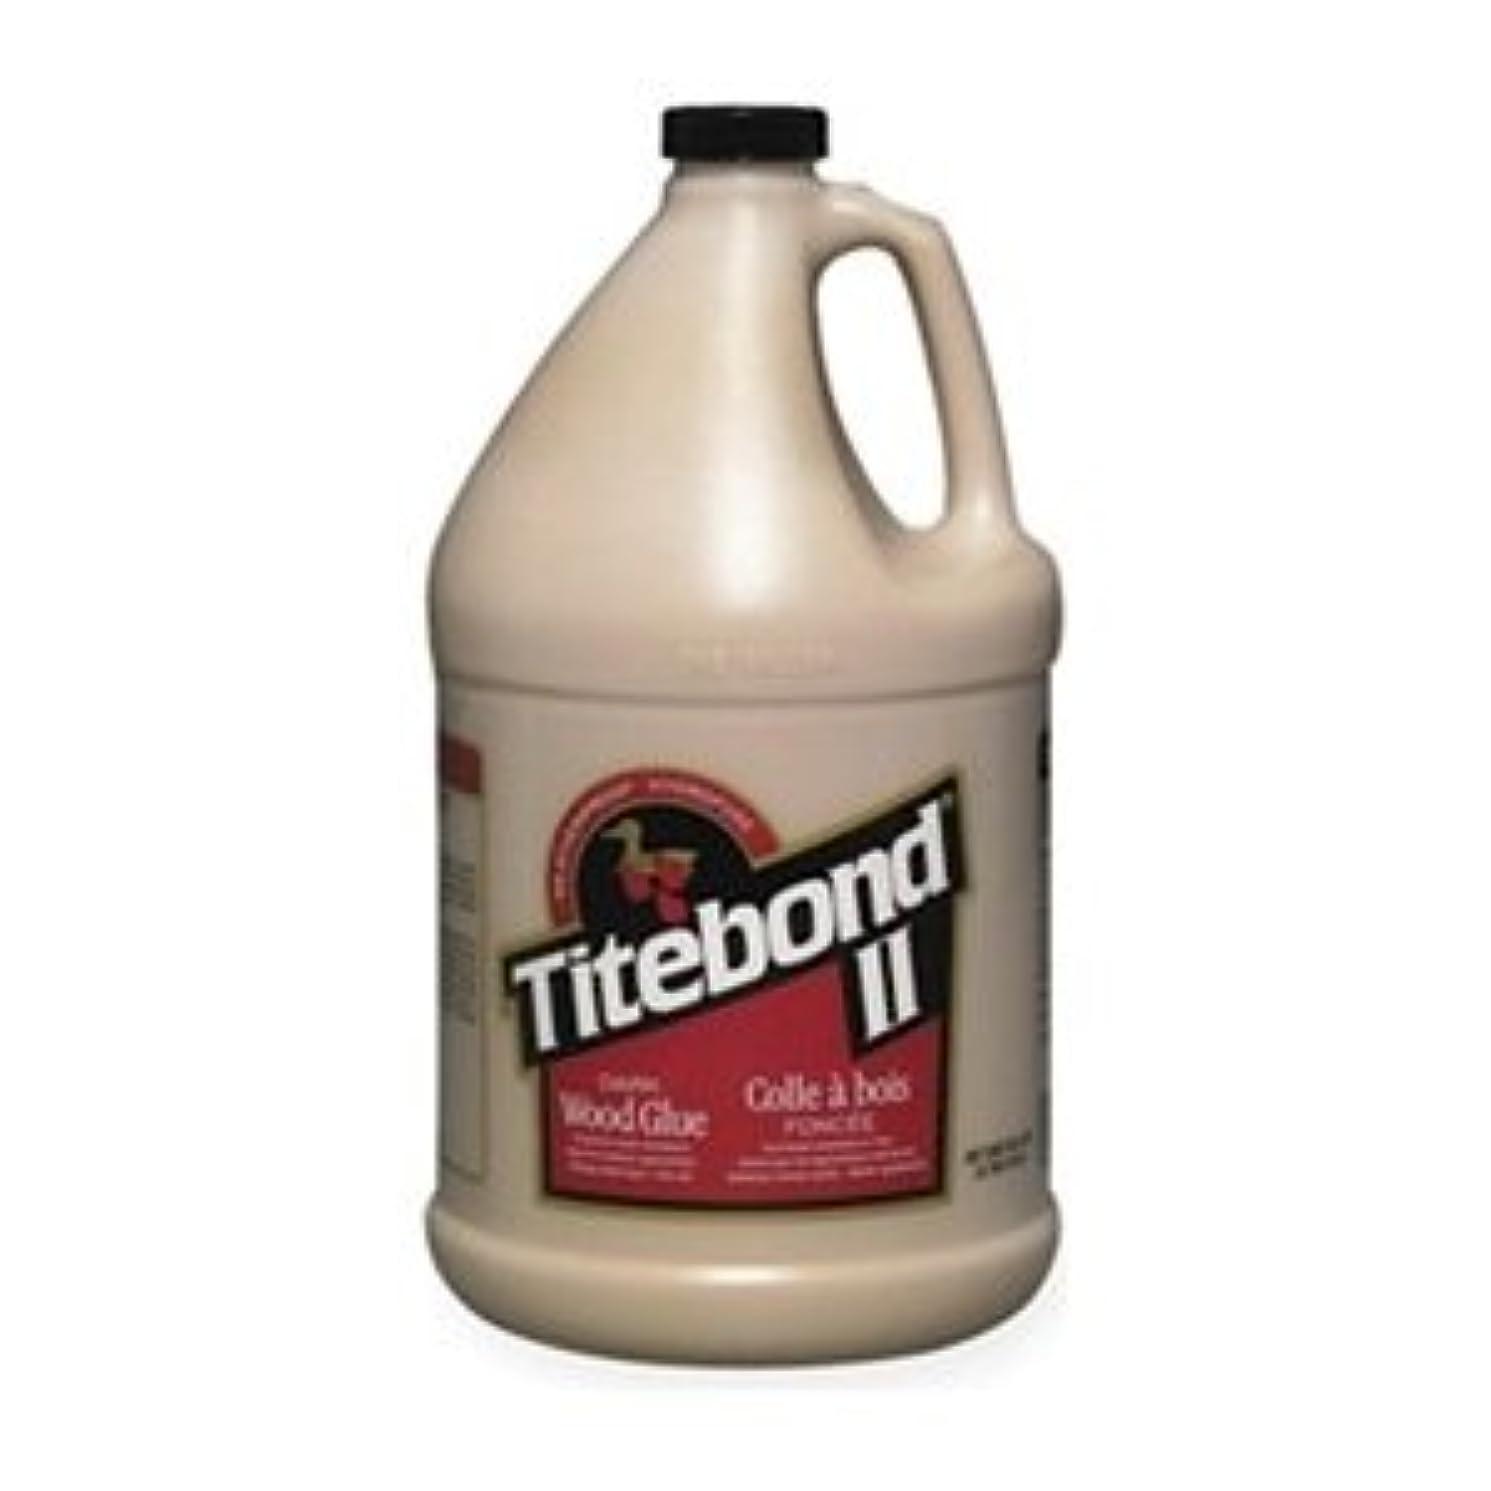 Titebond 3706 Wood Glue, Dark, 1 Gal, Brown mg393164440481